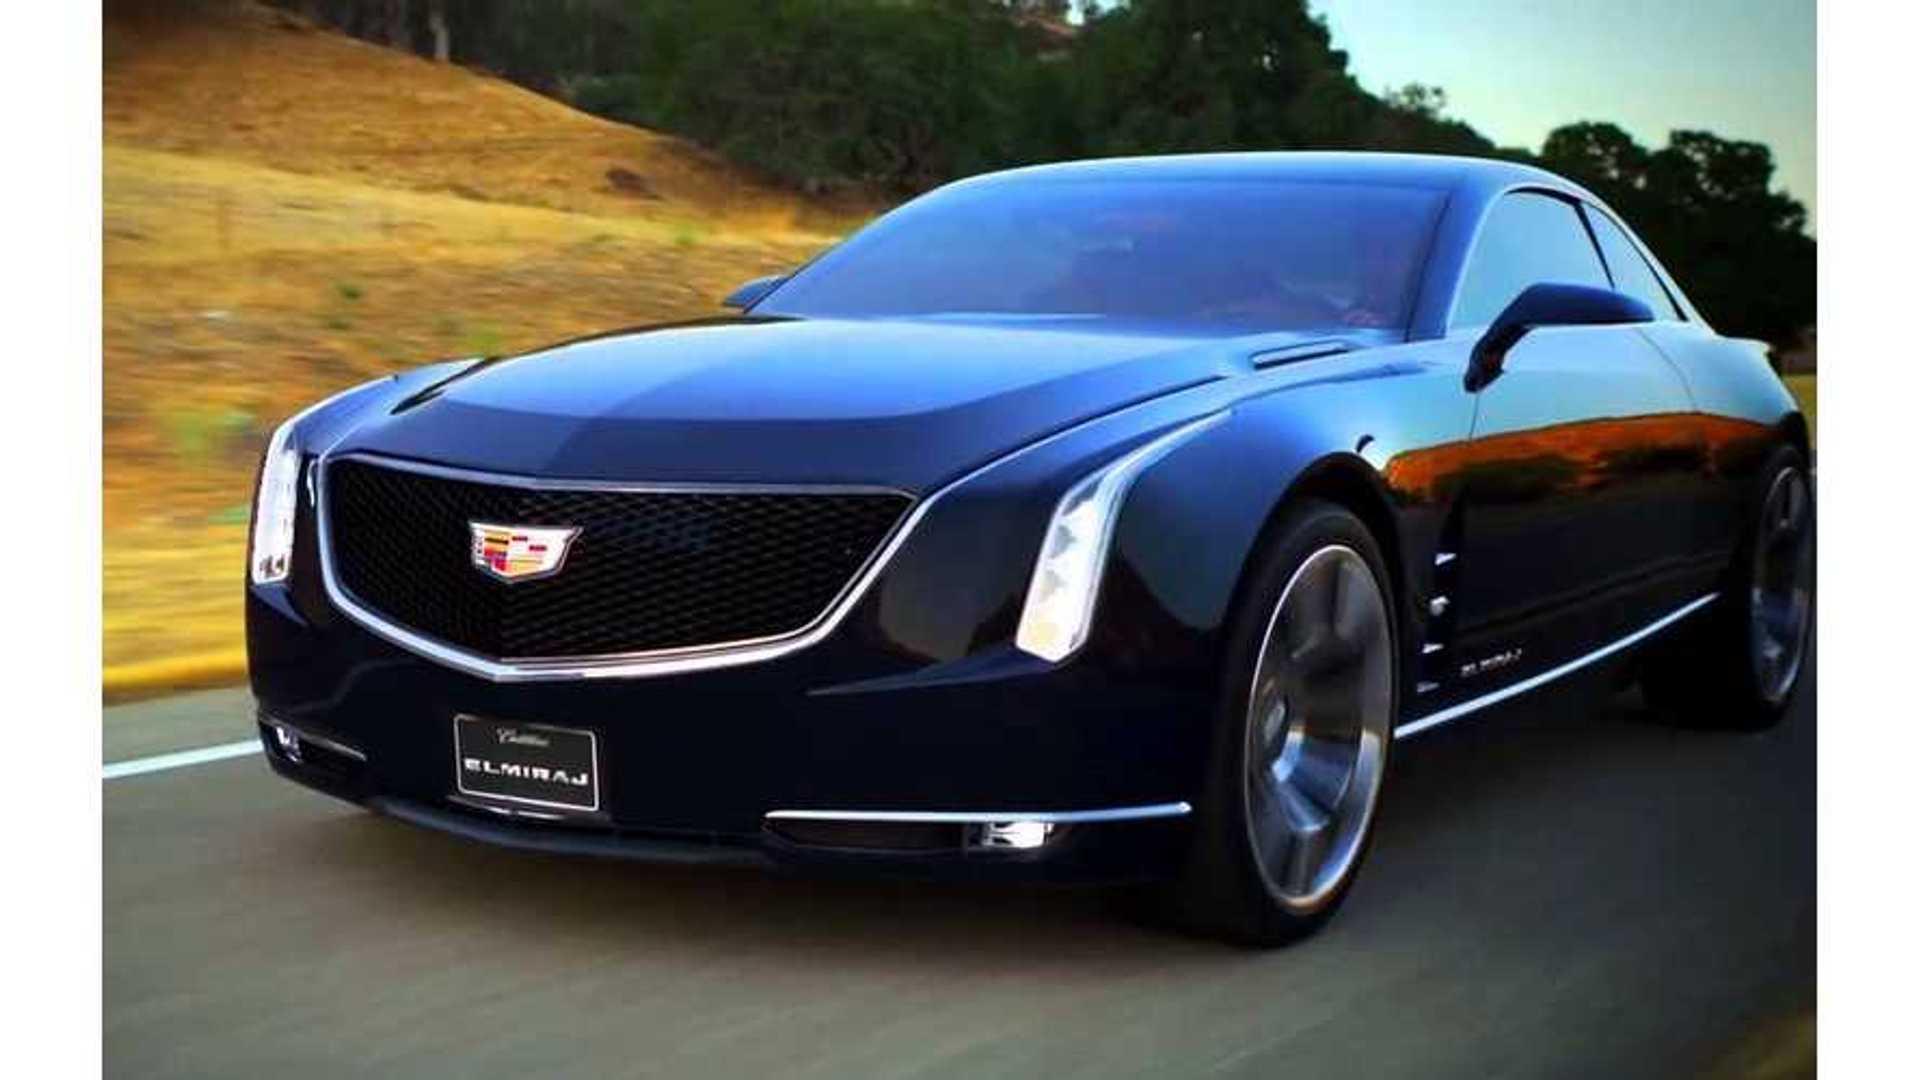 2020 Cadillac XT4 - View Specs, Prices & Photos - WHEELS.ca